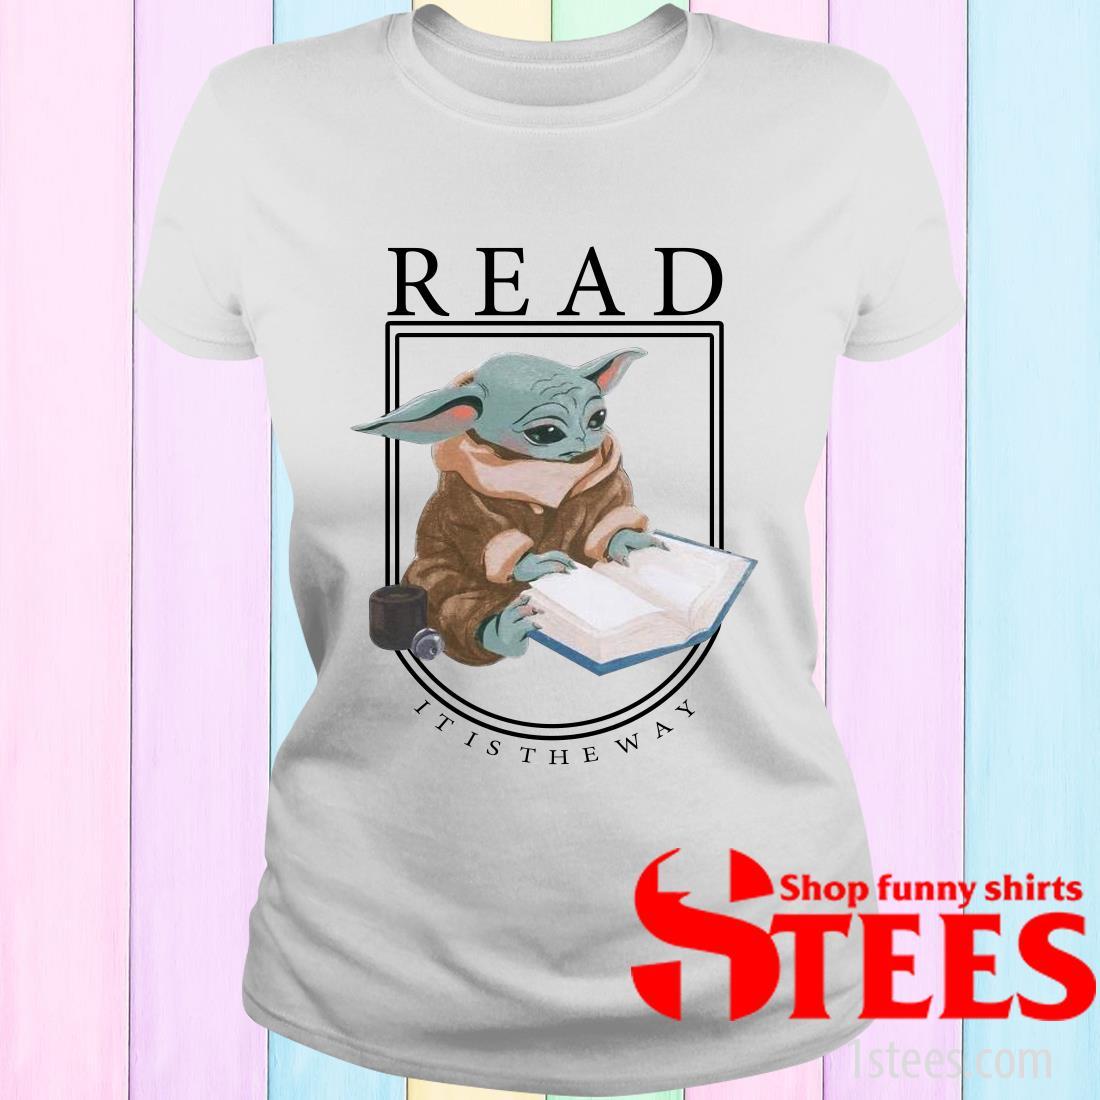 Baby Yoda Read It Is The Way Women's T-Shirt